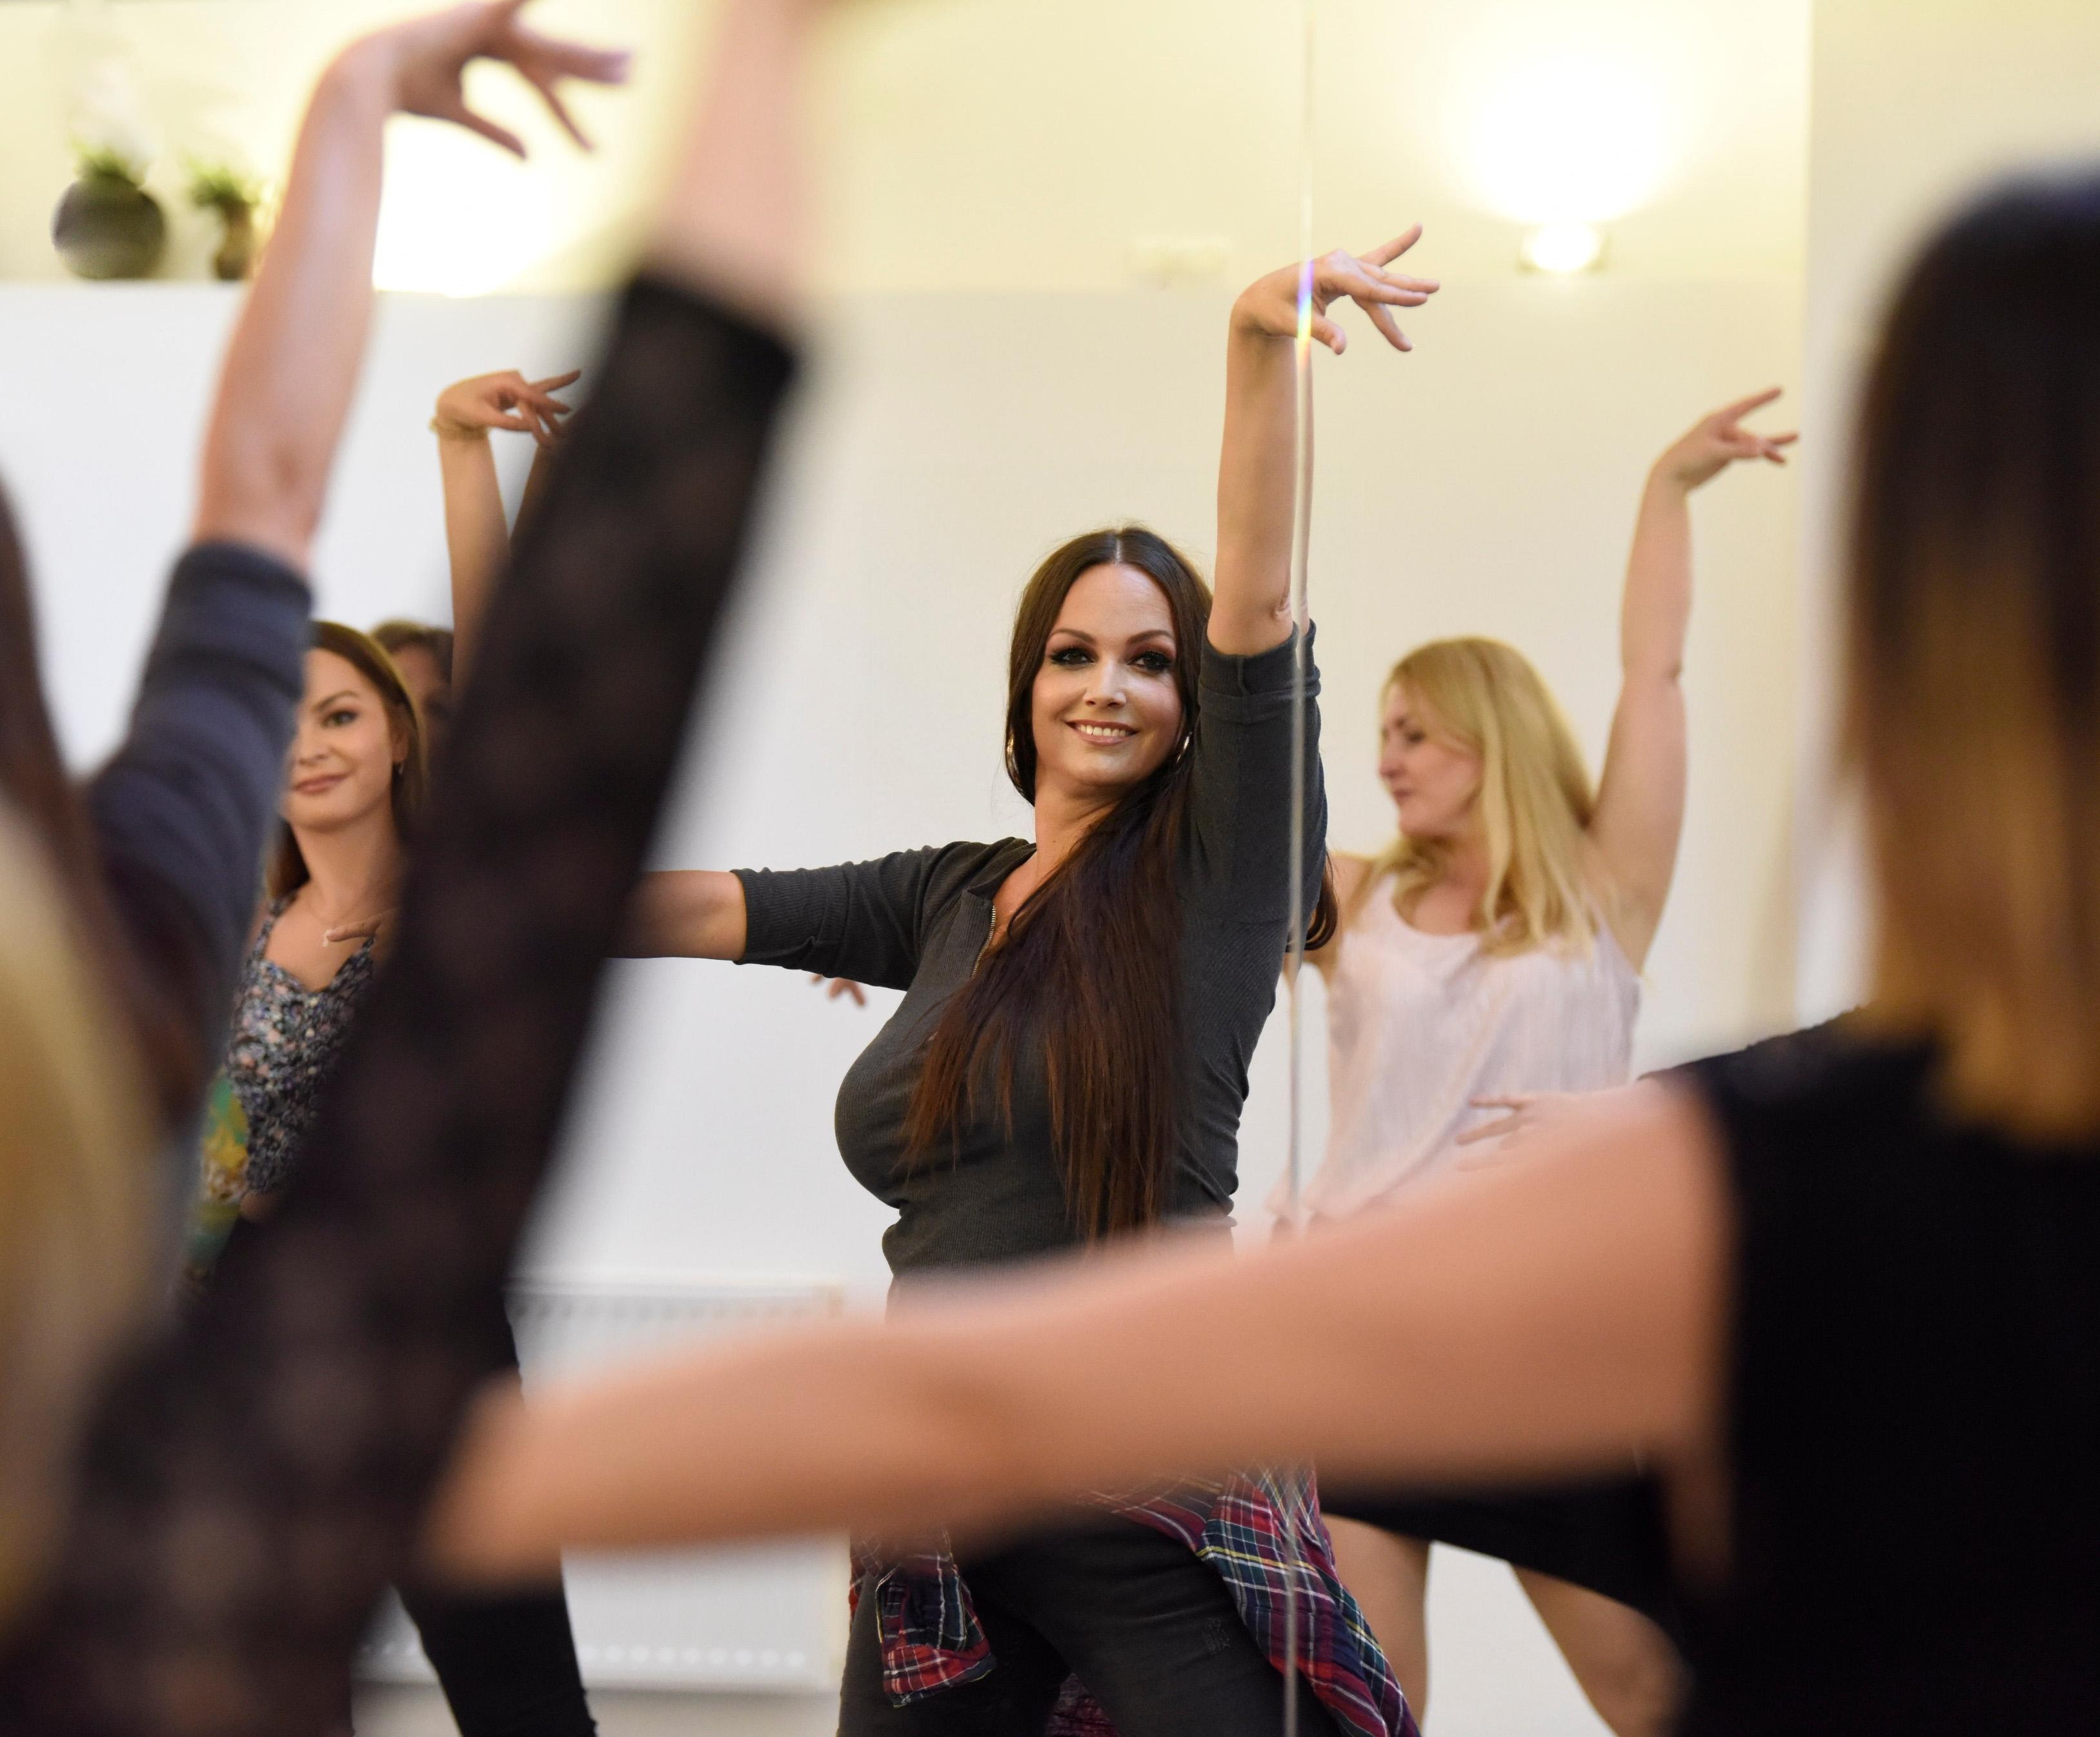 la_cati_dance_bachatala_cati_dance_bachata